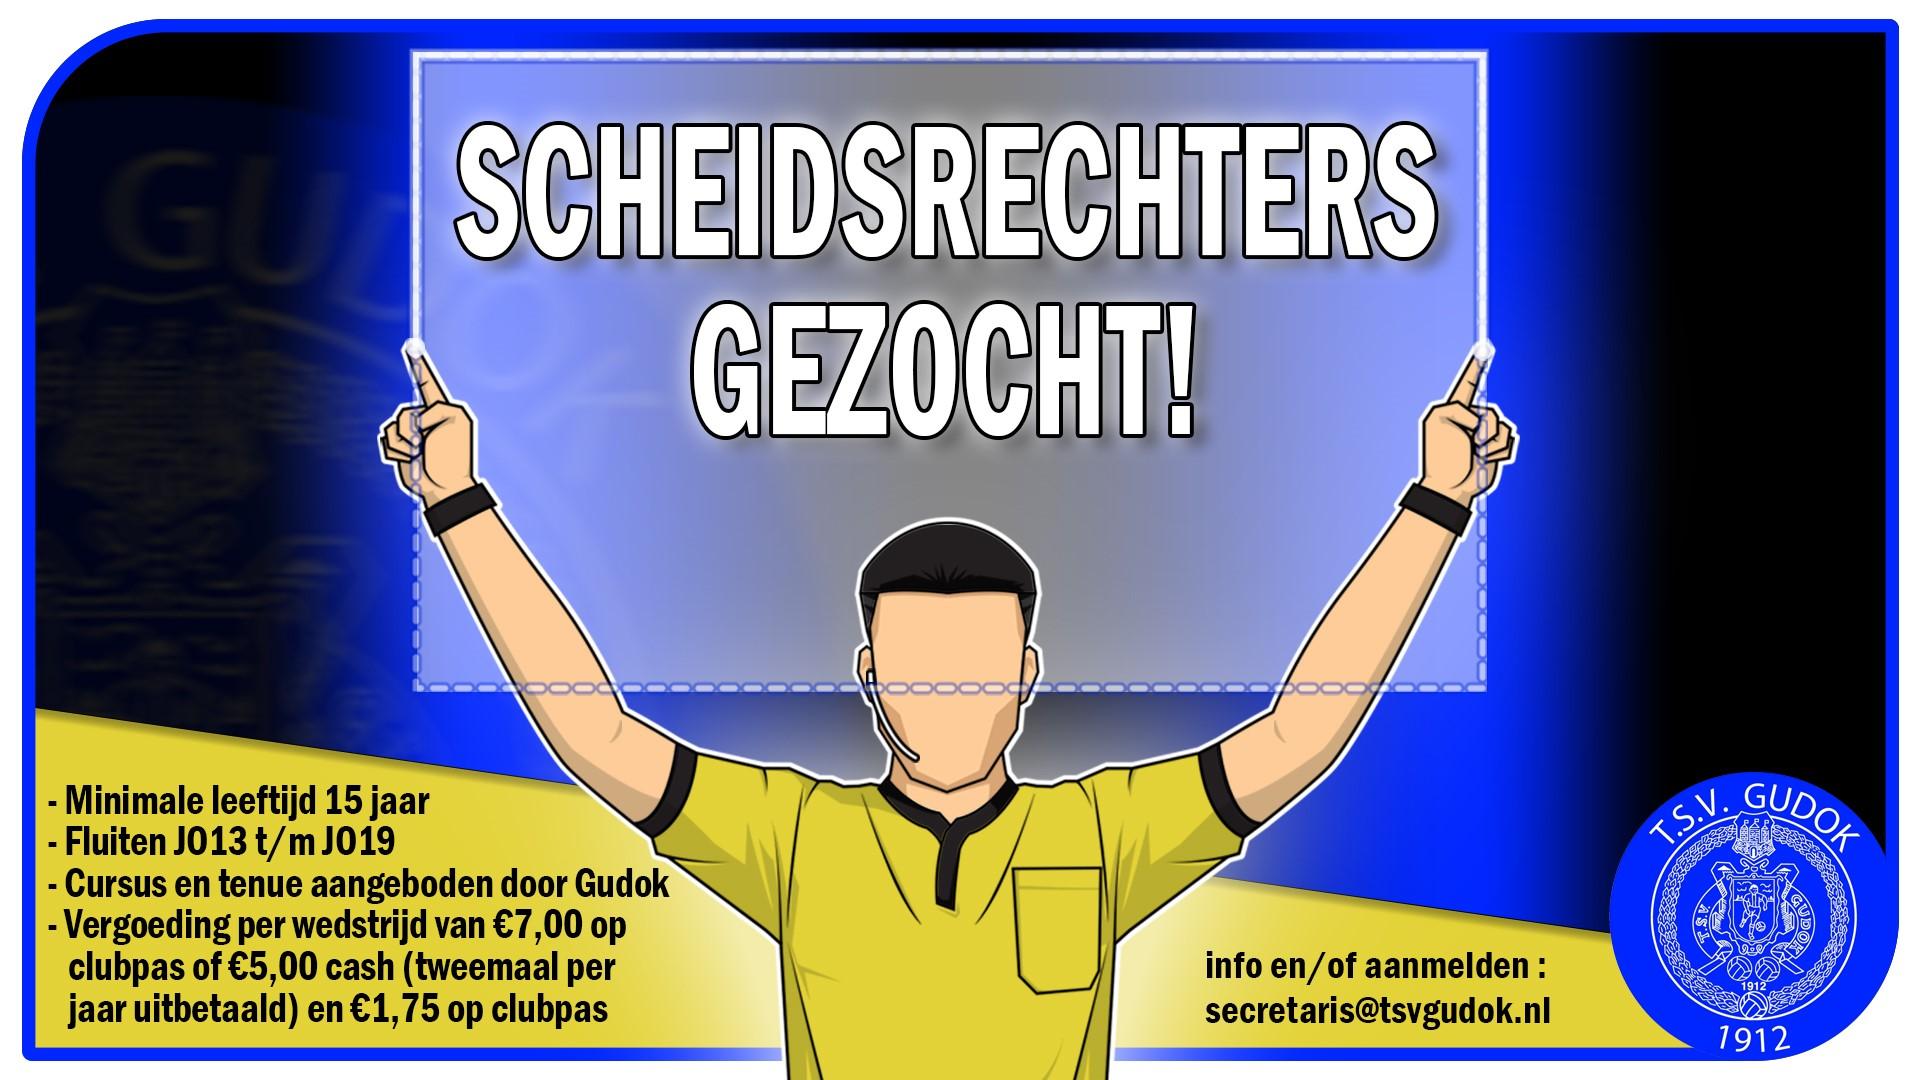 Scheidsrechters gezocht!!!